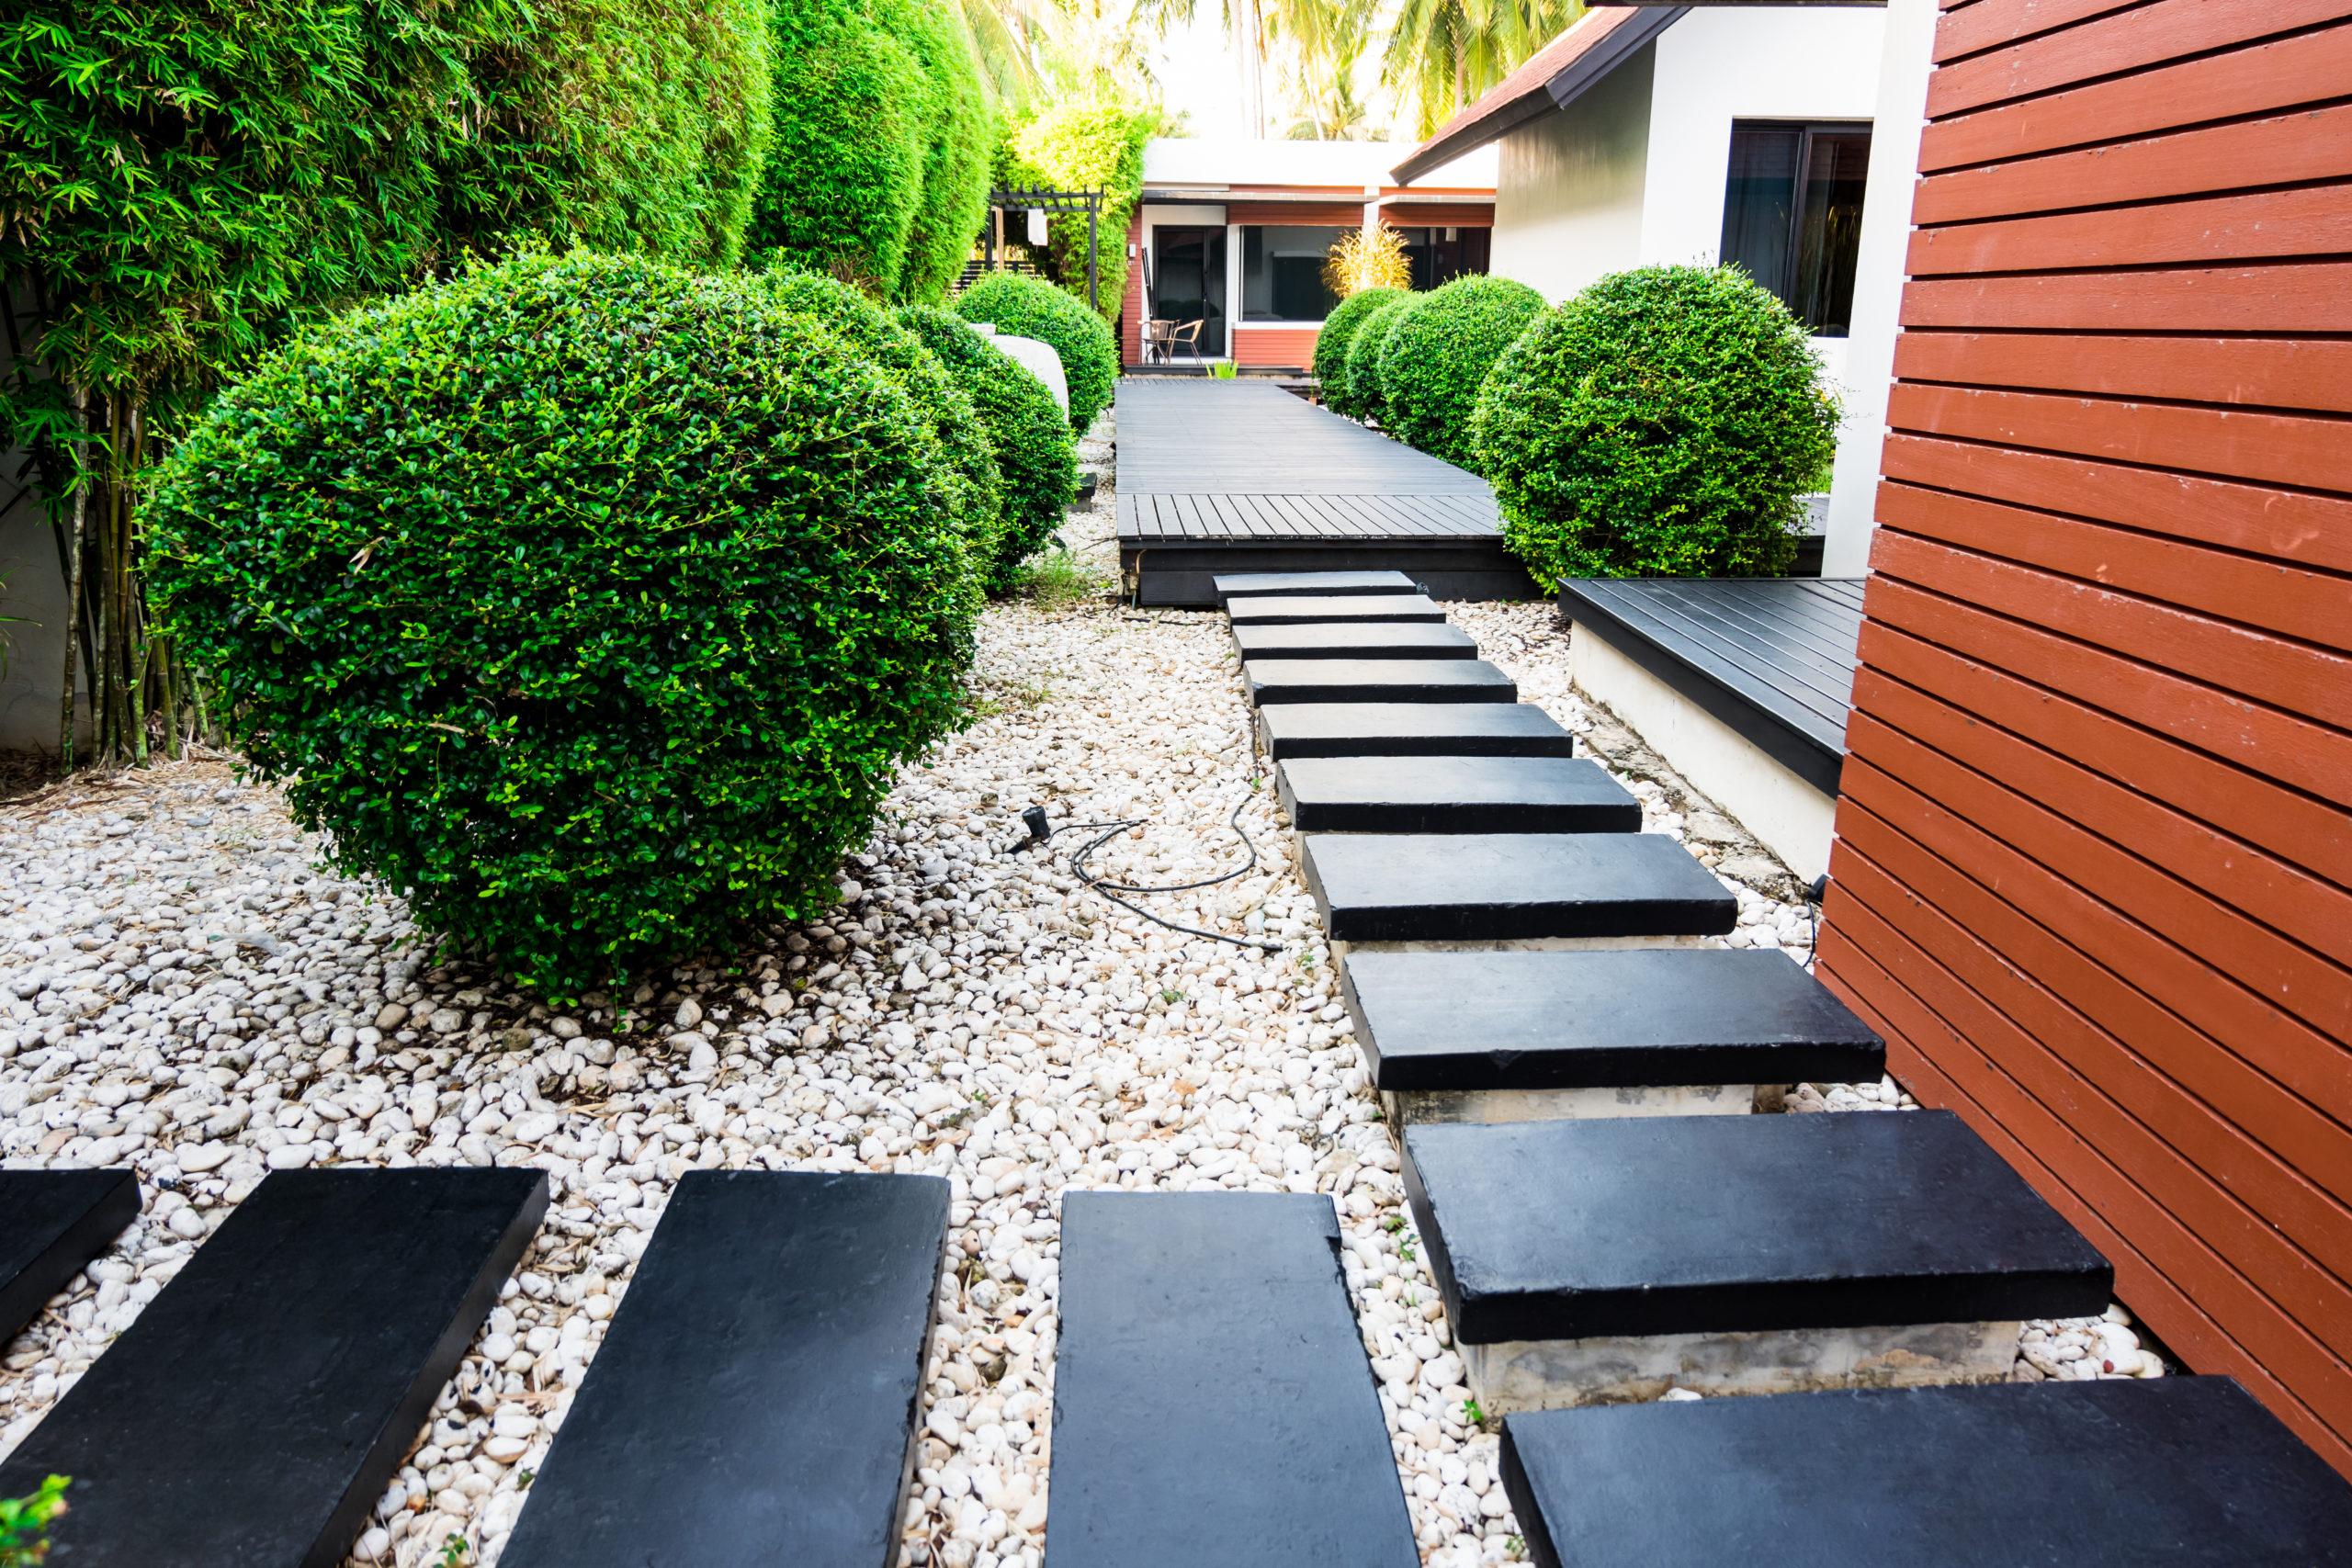 Decorative Rocks for Landscaping: 3 Backyard Design Ideas ... on Rocks For Backyard  id=49187